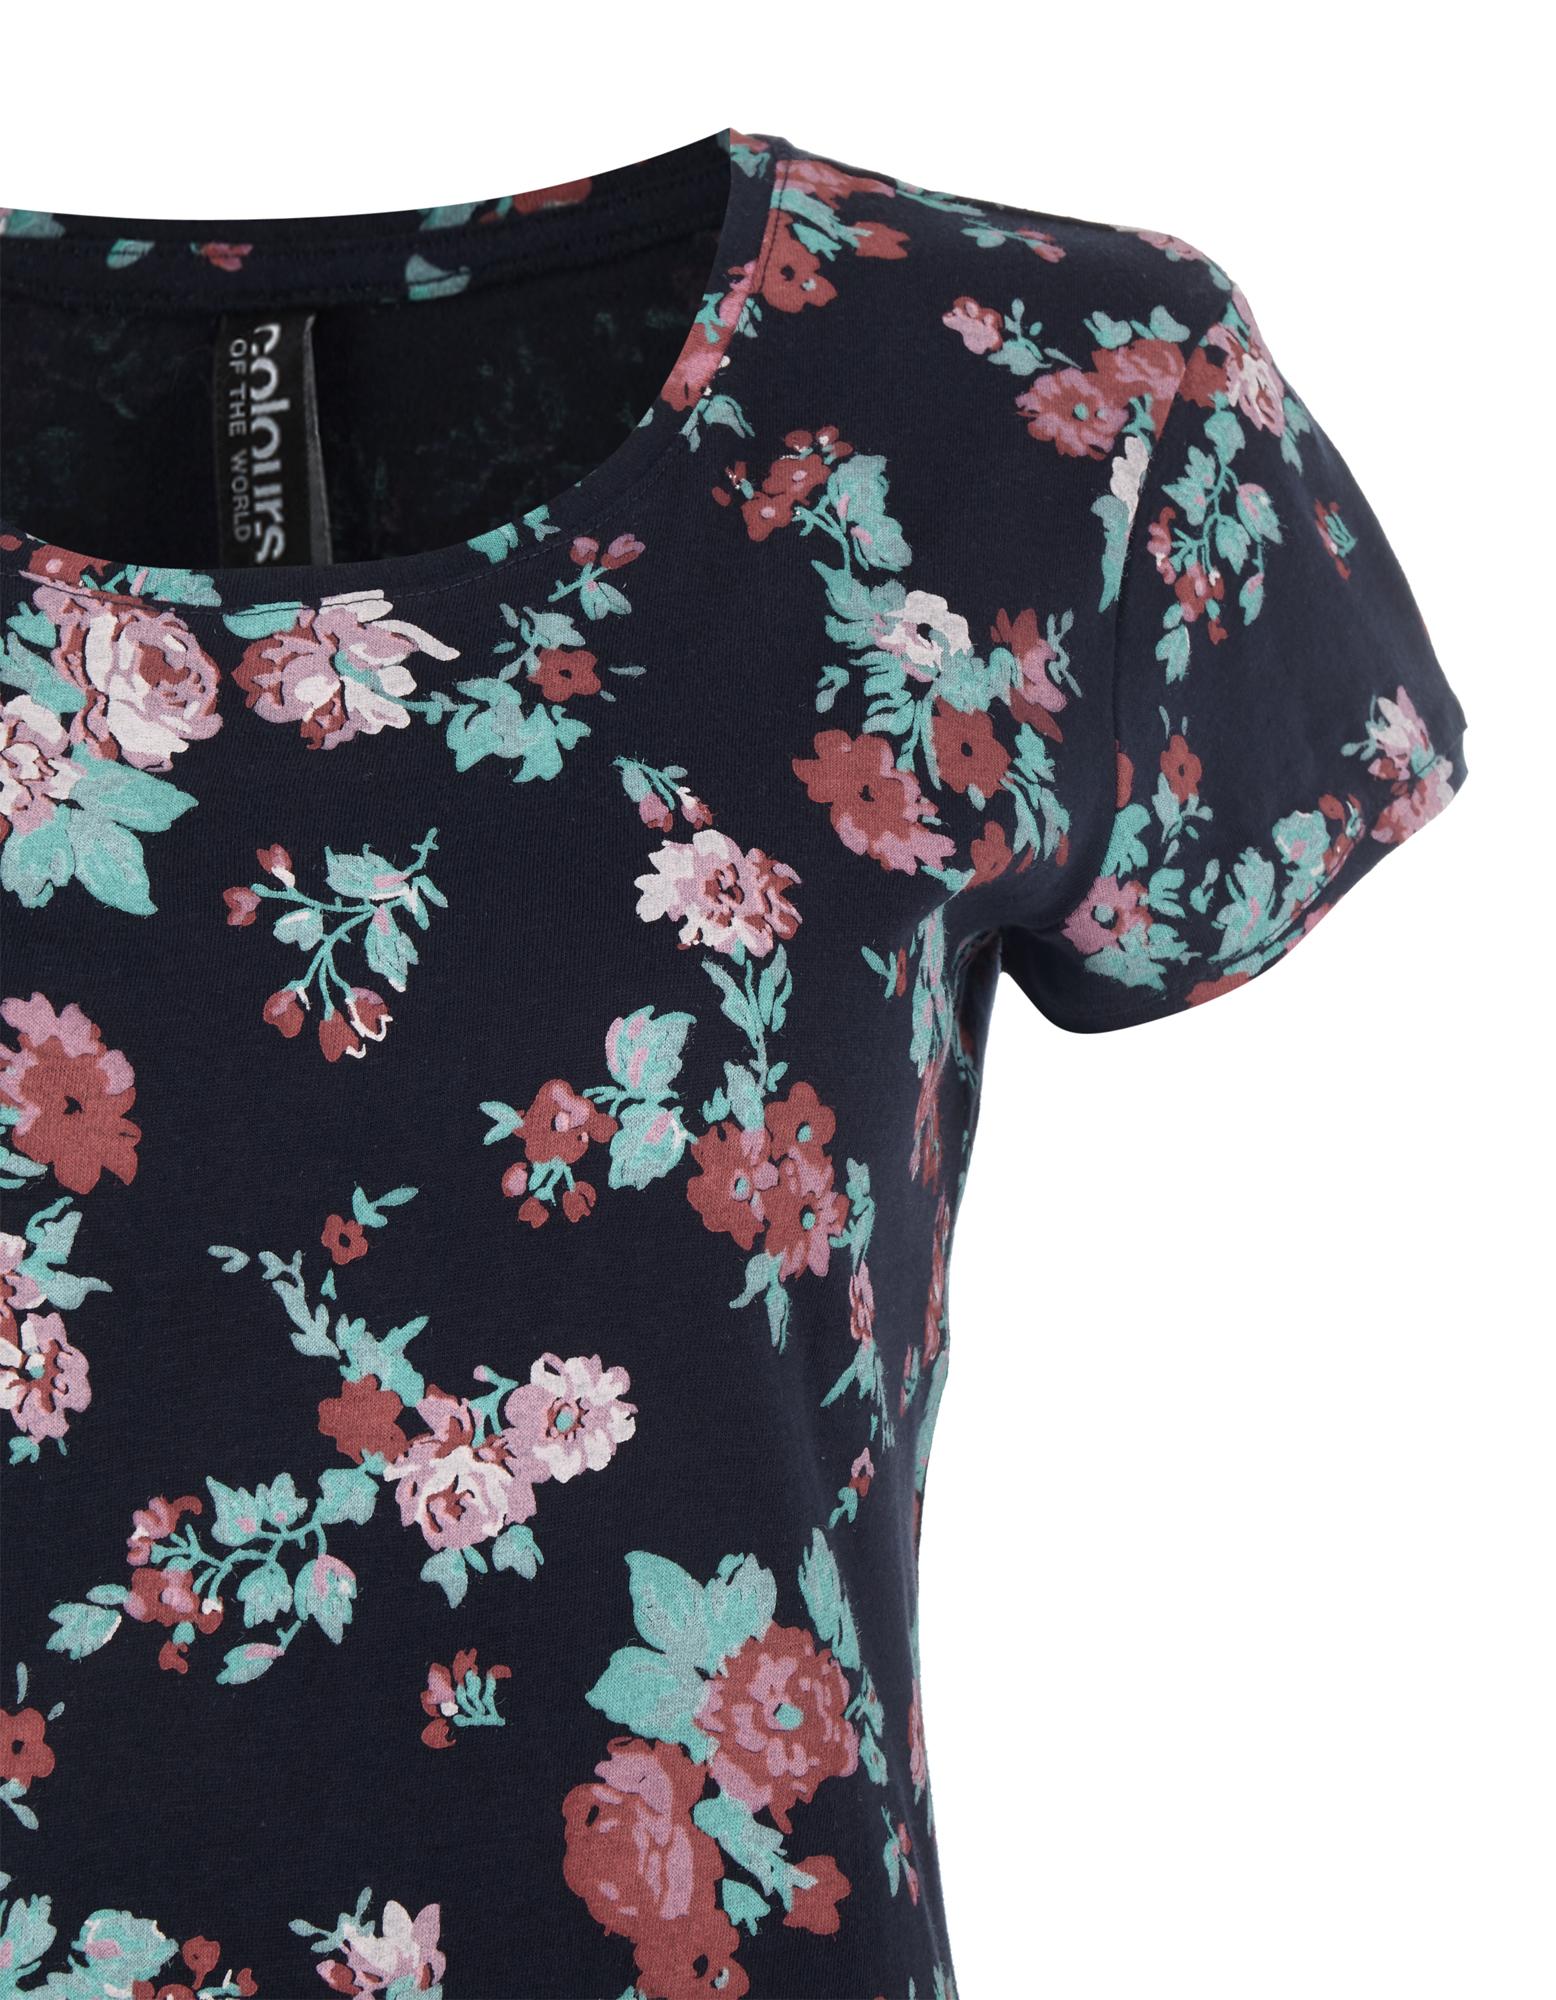 damen t shirt mit rosen print takko fashion. Black Bedroom Furniture Sets. Home Design Ideas